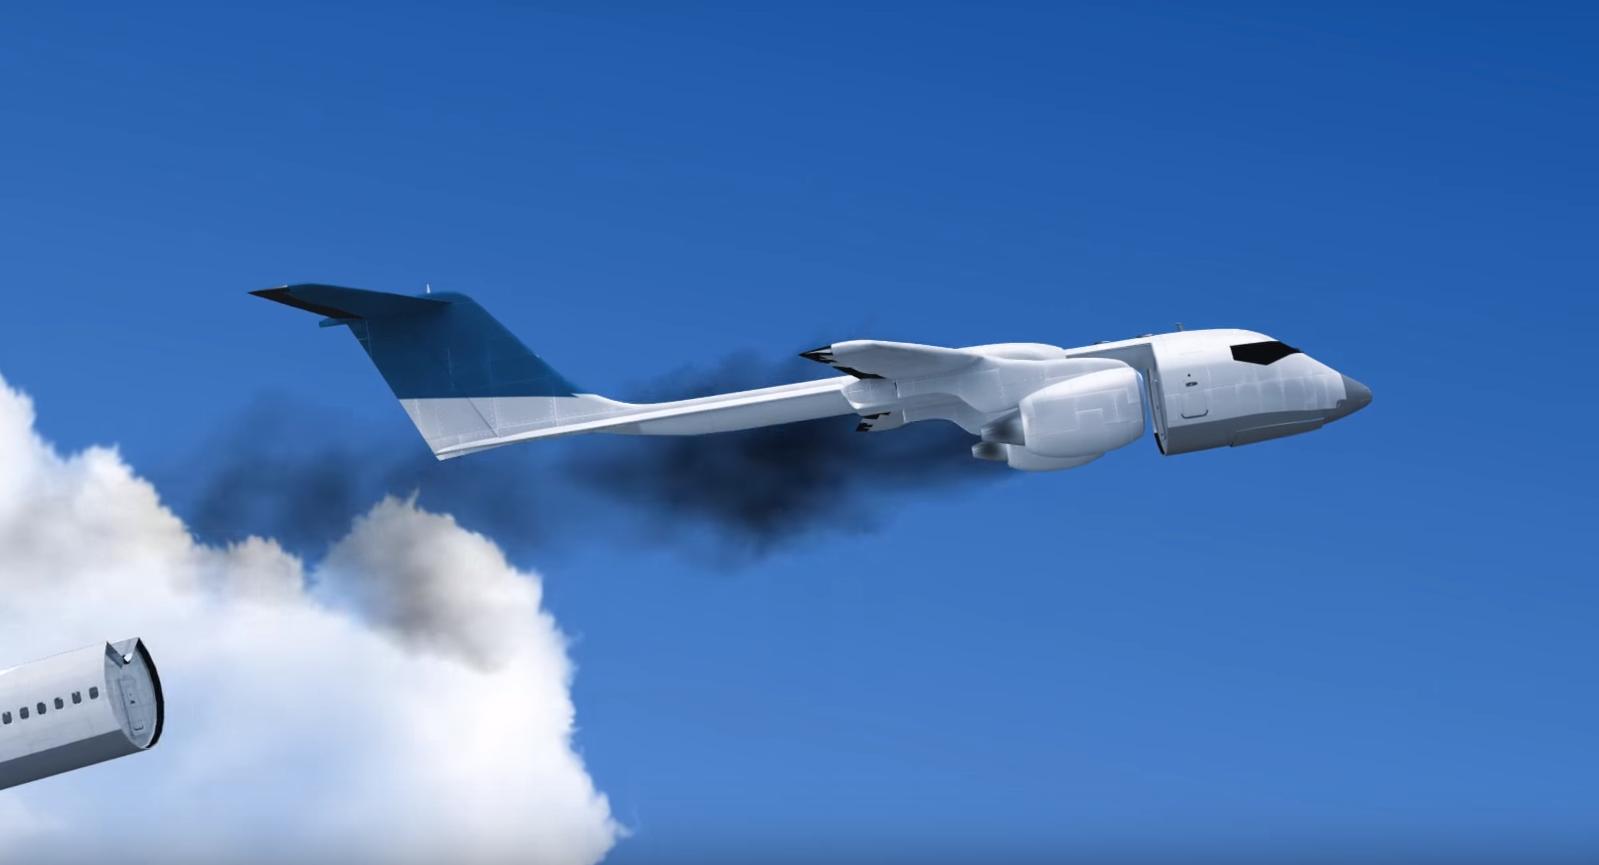 cabina avion desmontable segura 7